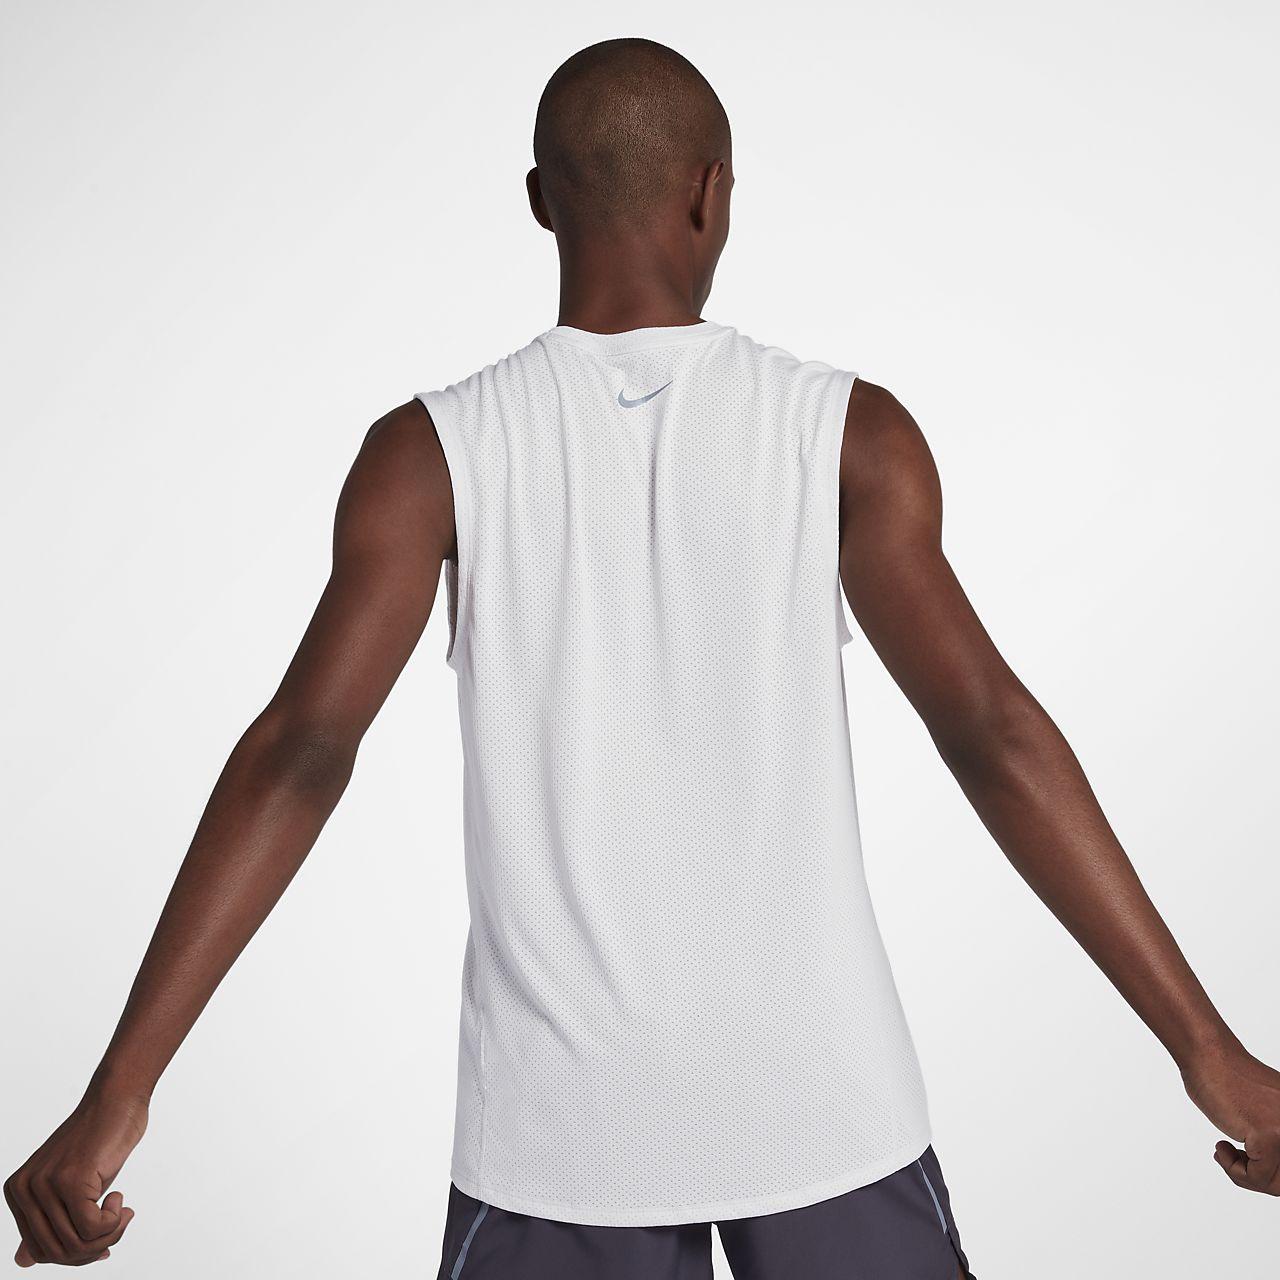 e82405d1c524a Nike Mens Miler Sleeveless Running Shirt – EDGE Engineering and ...